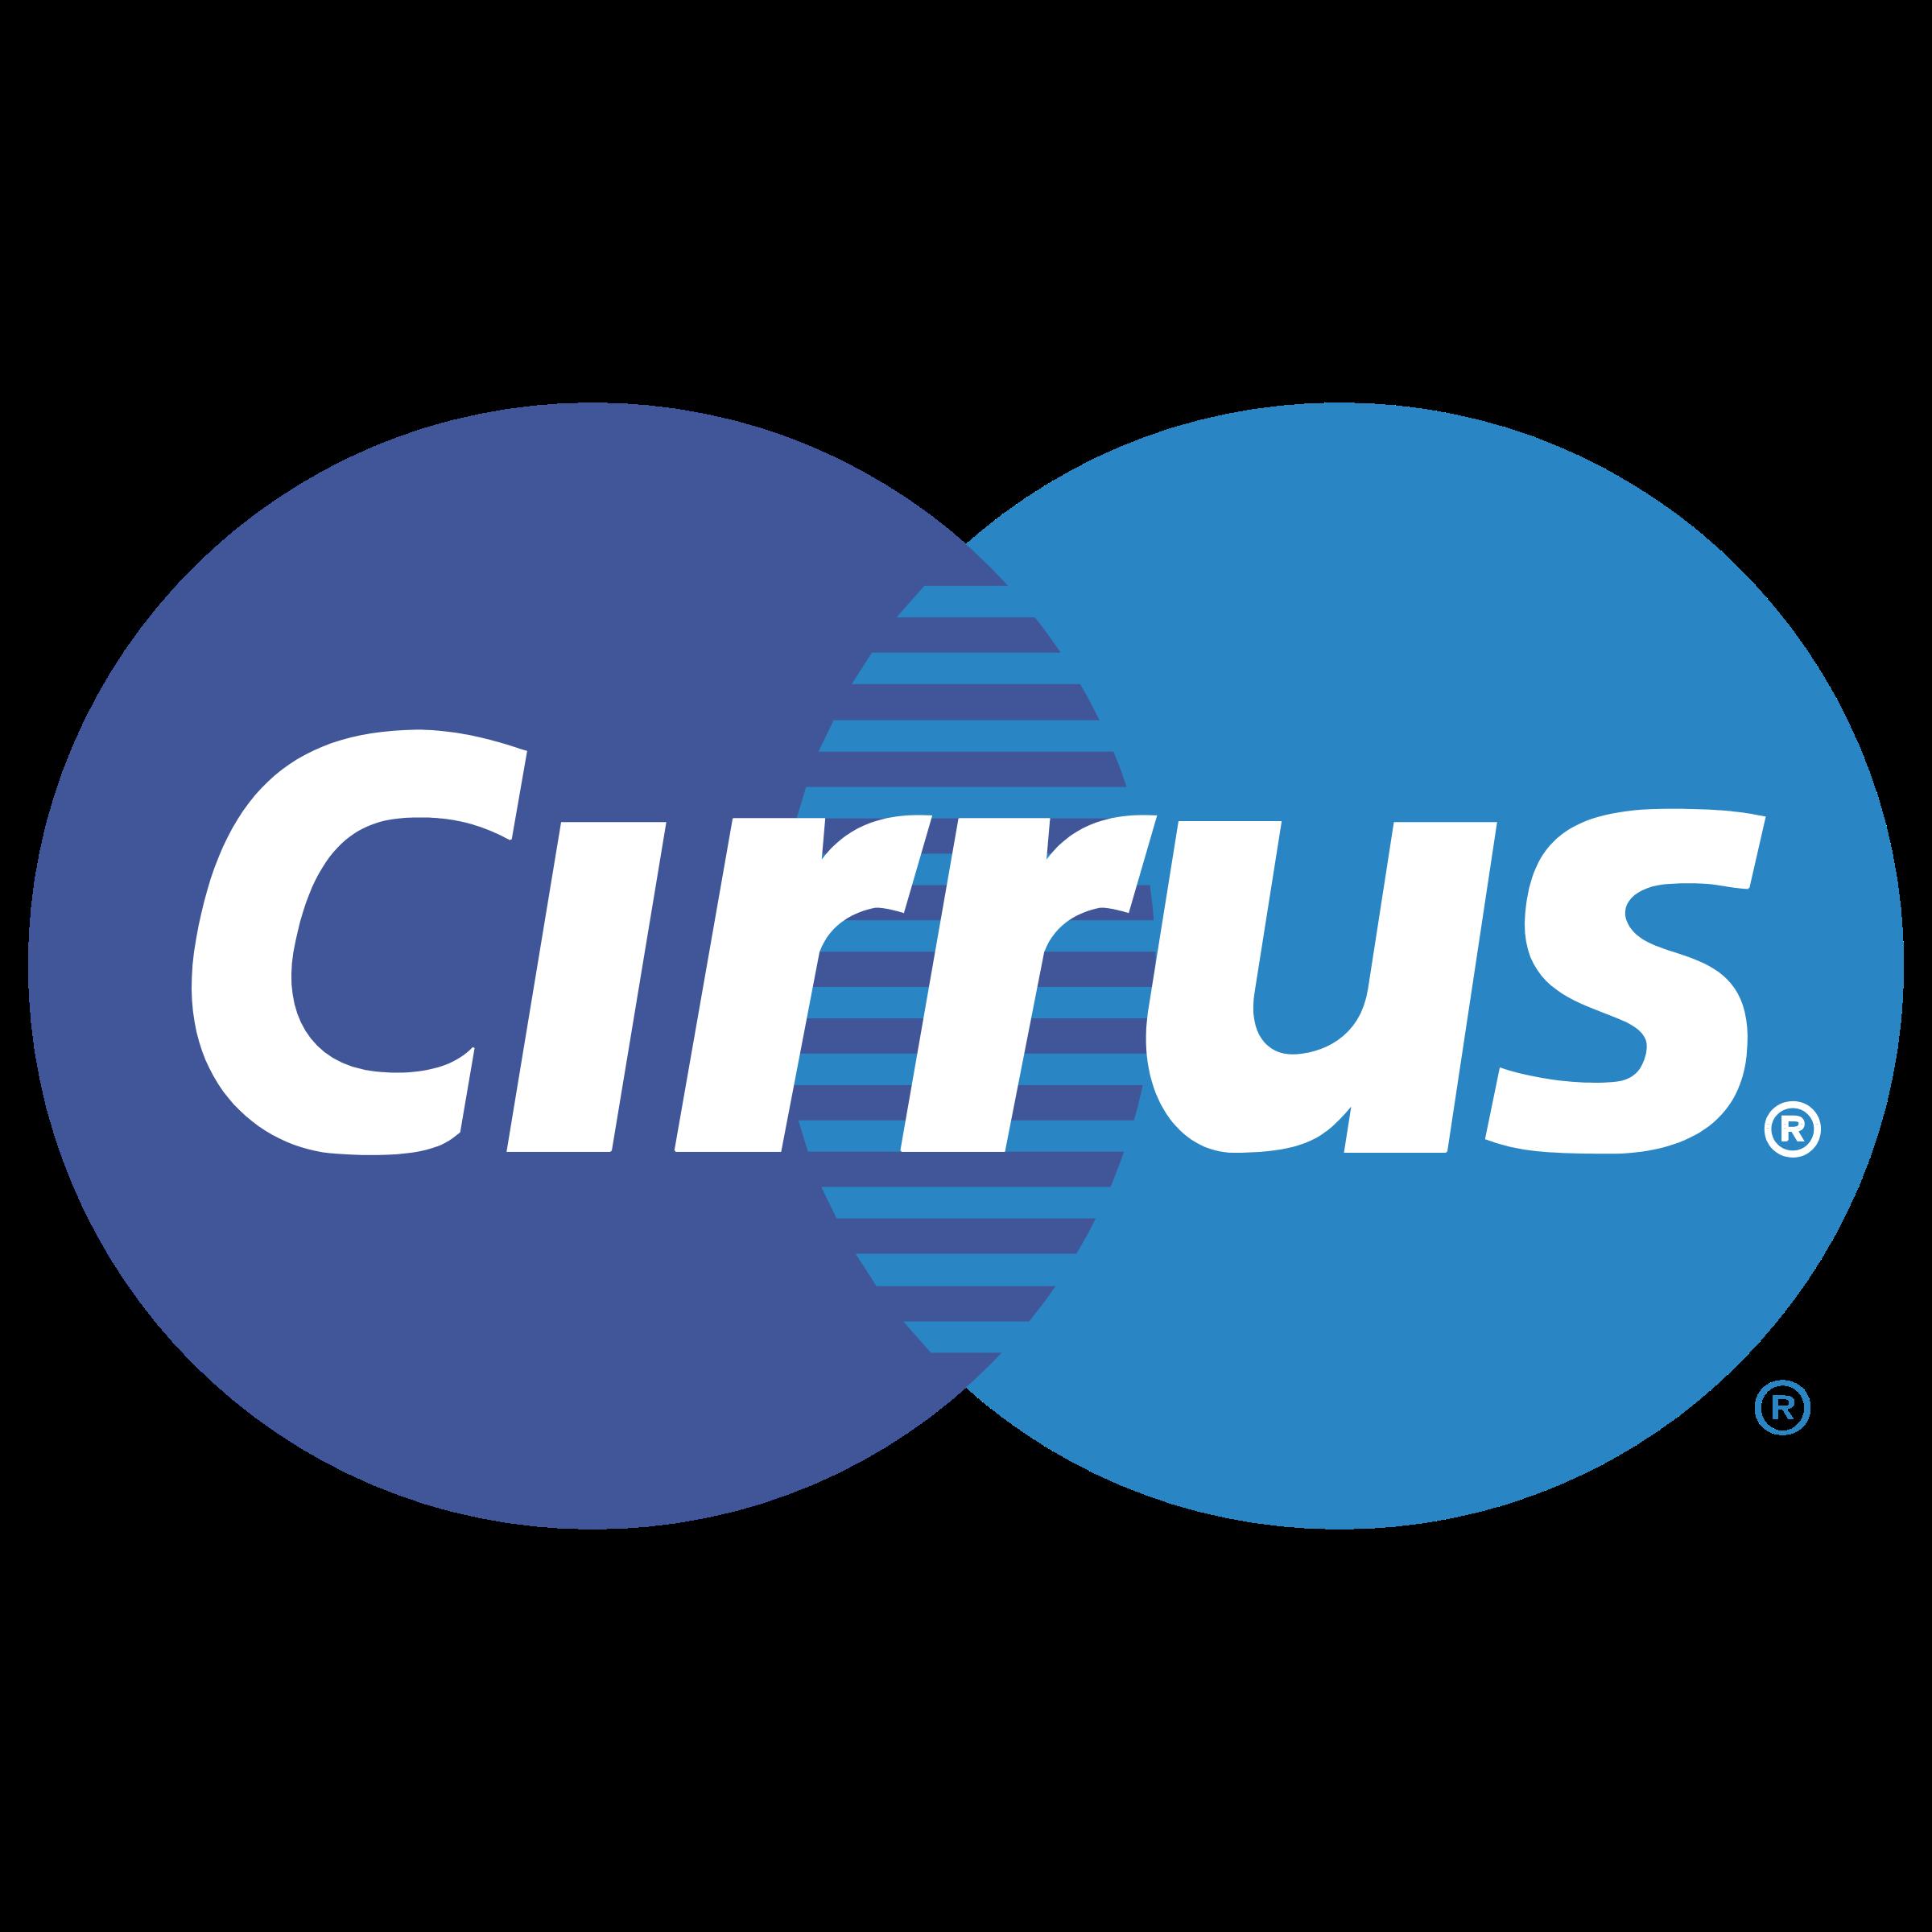 Cirrus 1197 Logo PNG Transparent